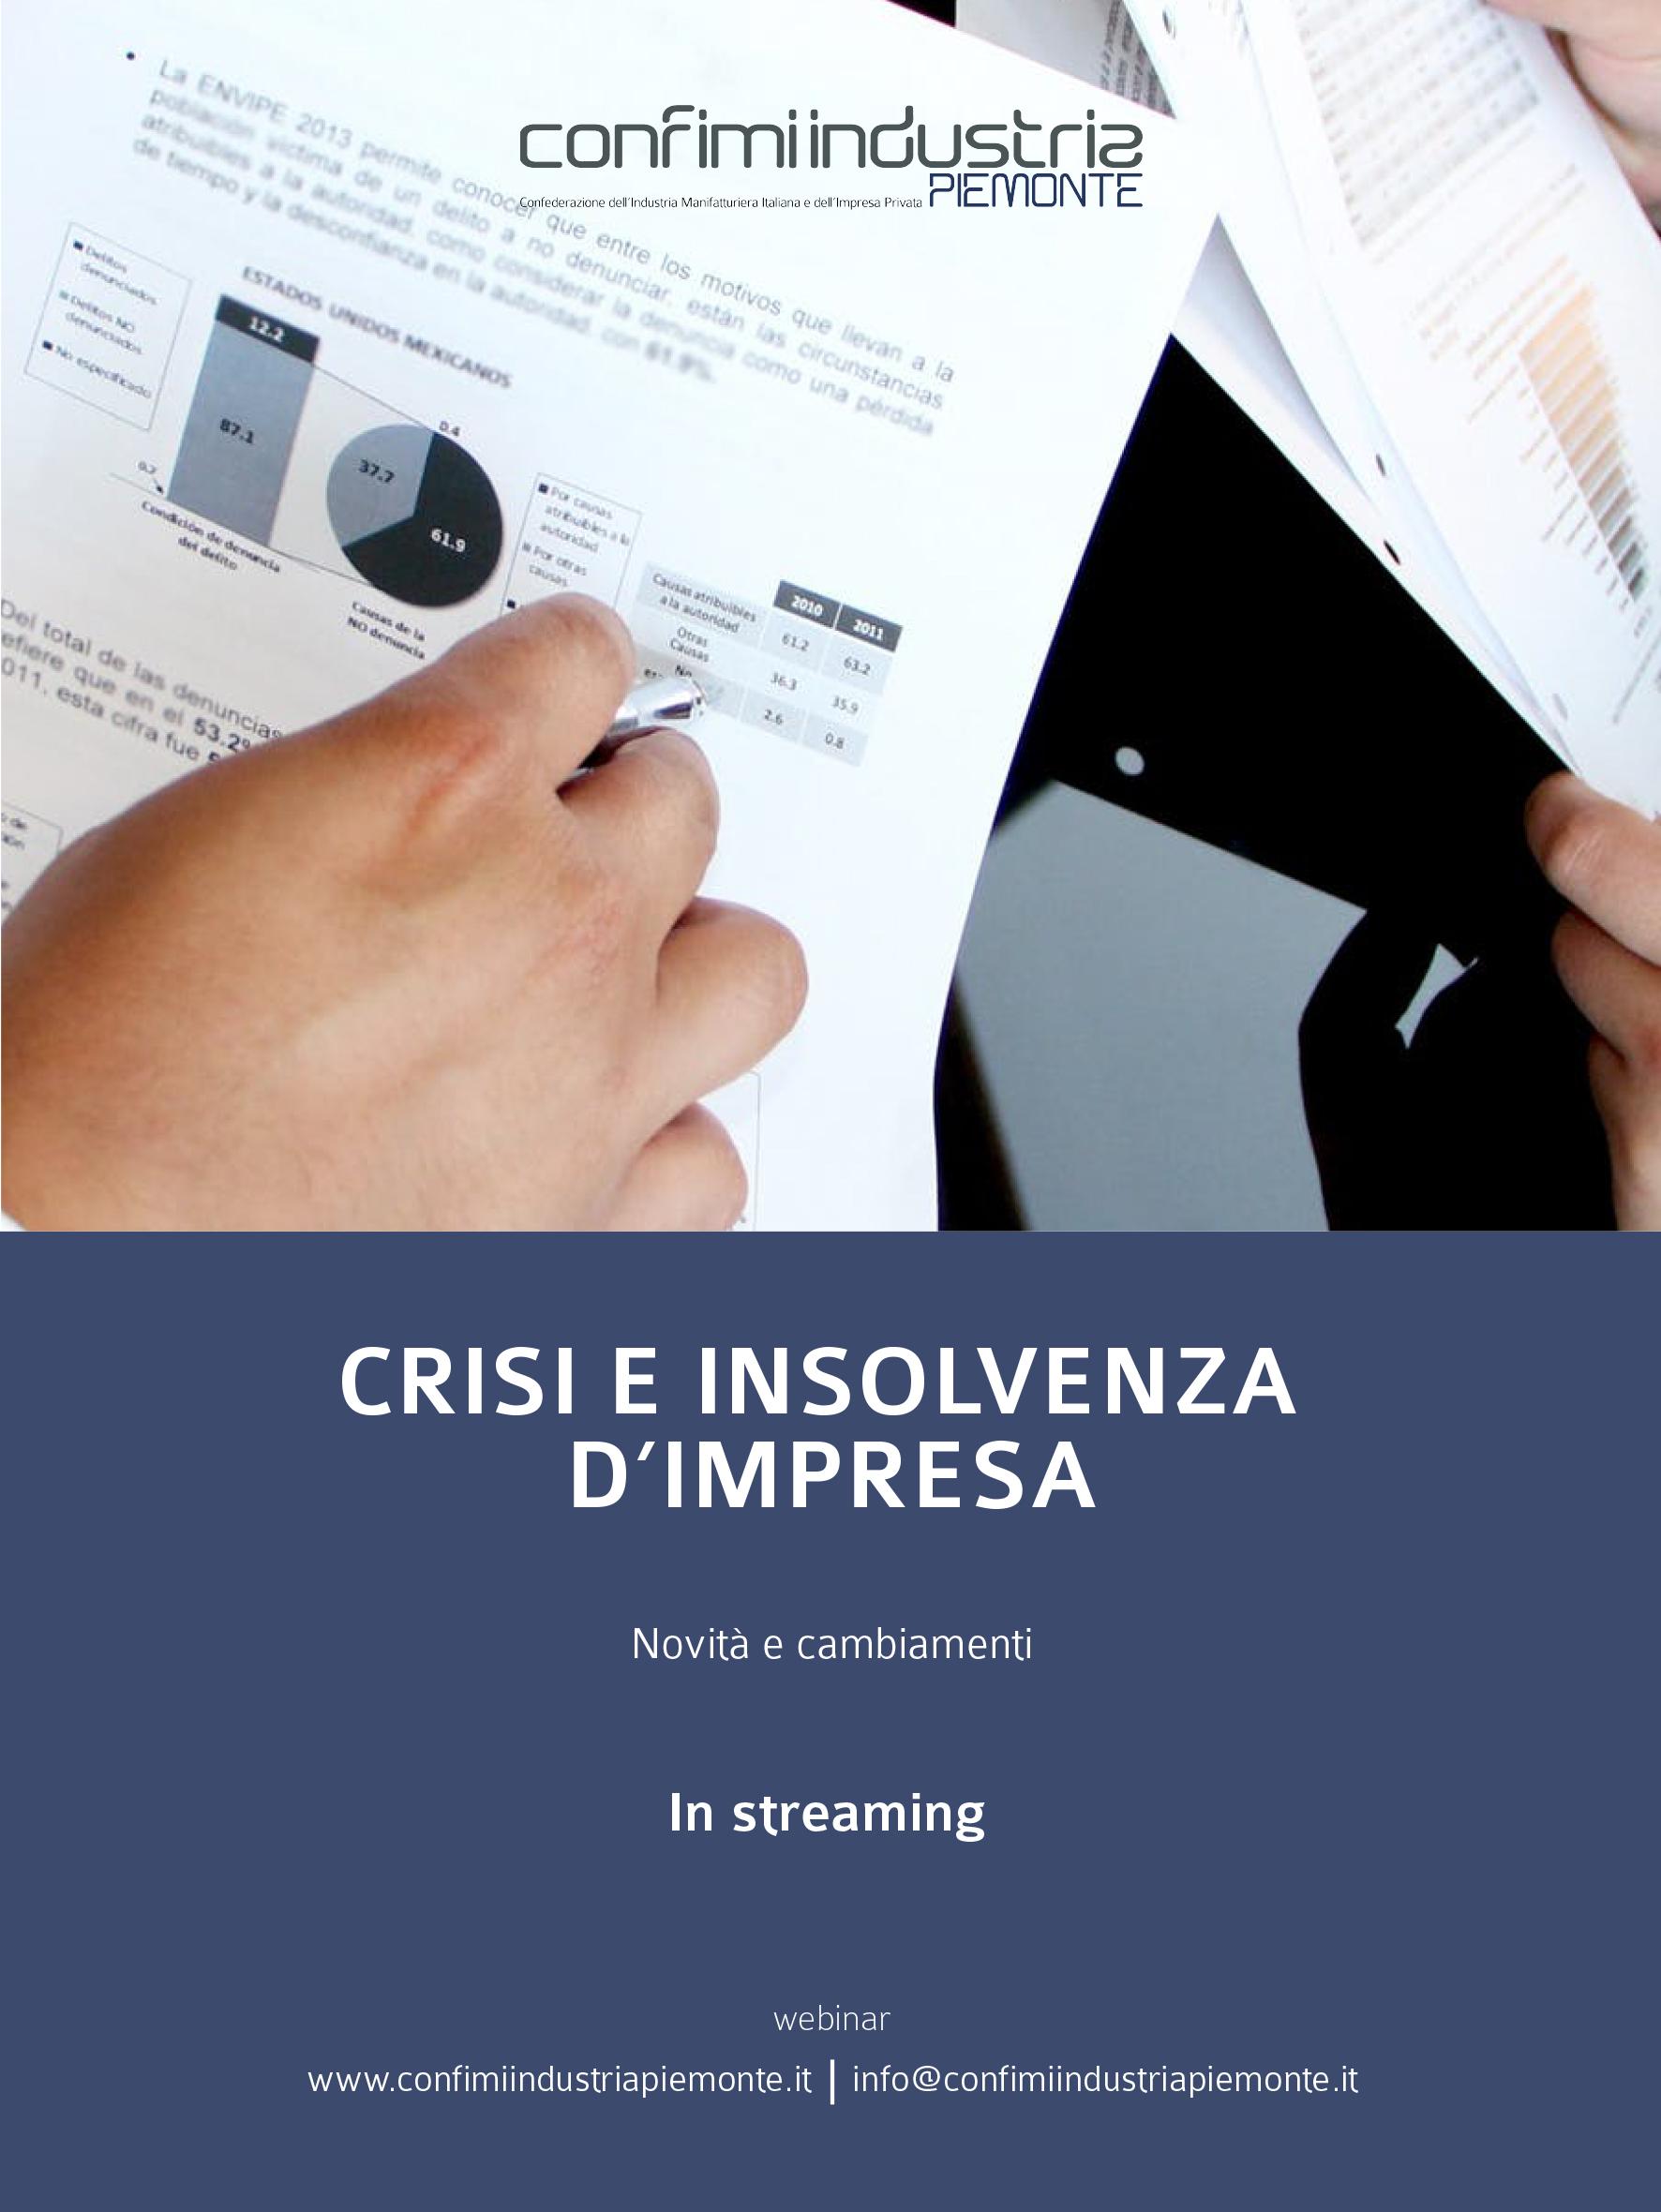 Flyer - Crisi e insolvenza d'impresa